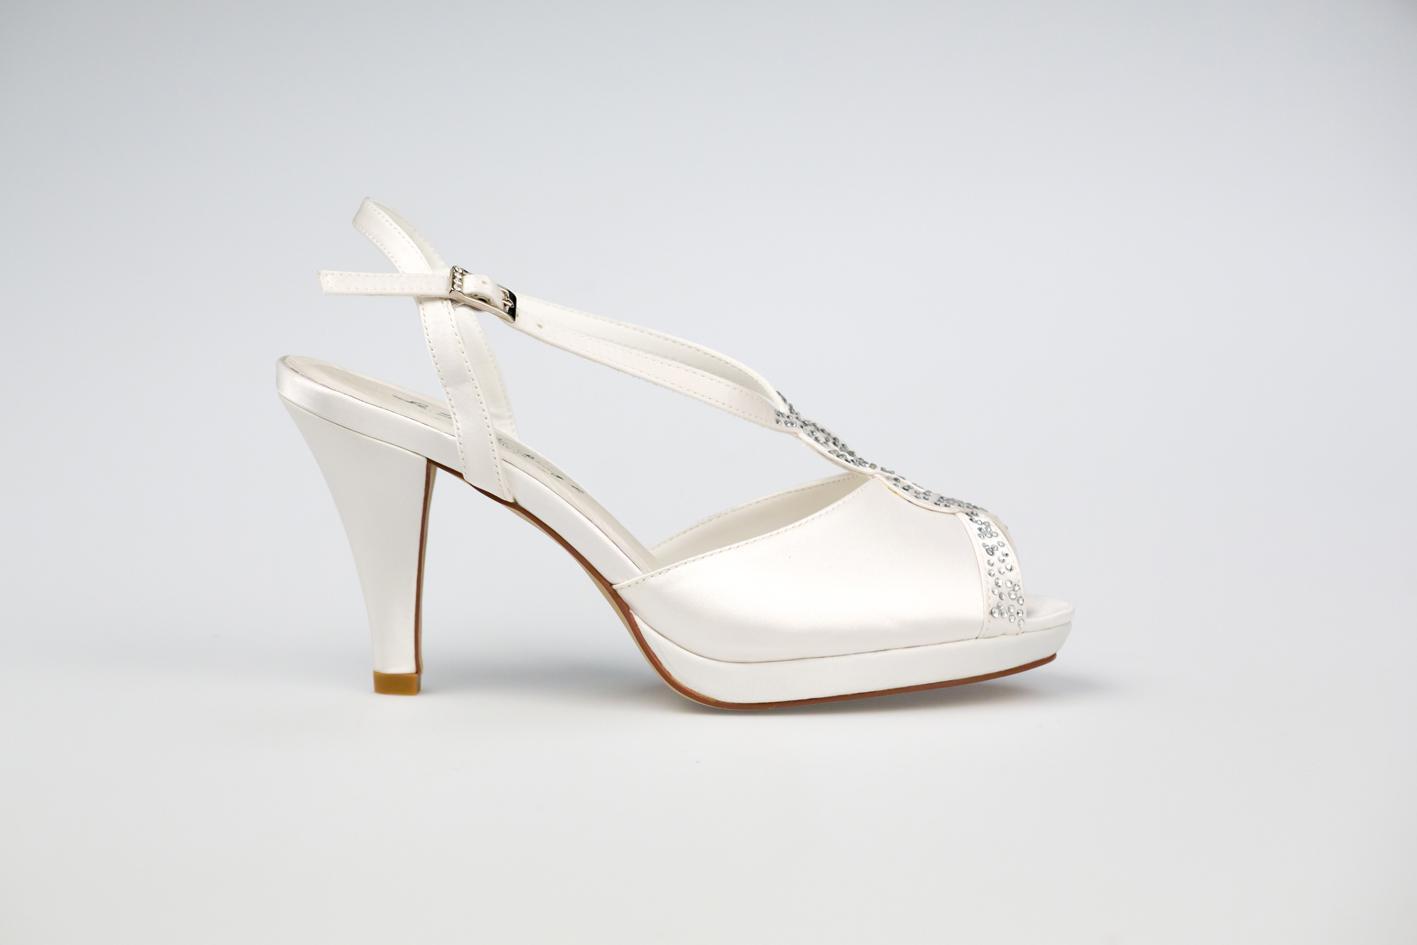 REBECCA - Westerleigh cipő. 22.500 Ft, 8 cm sarok.